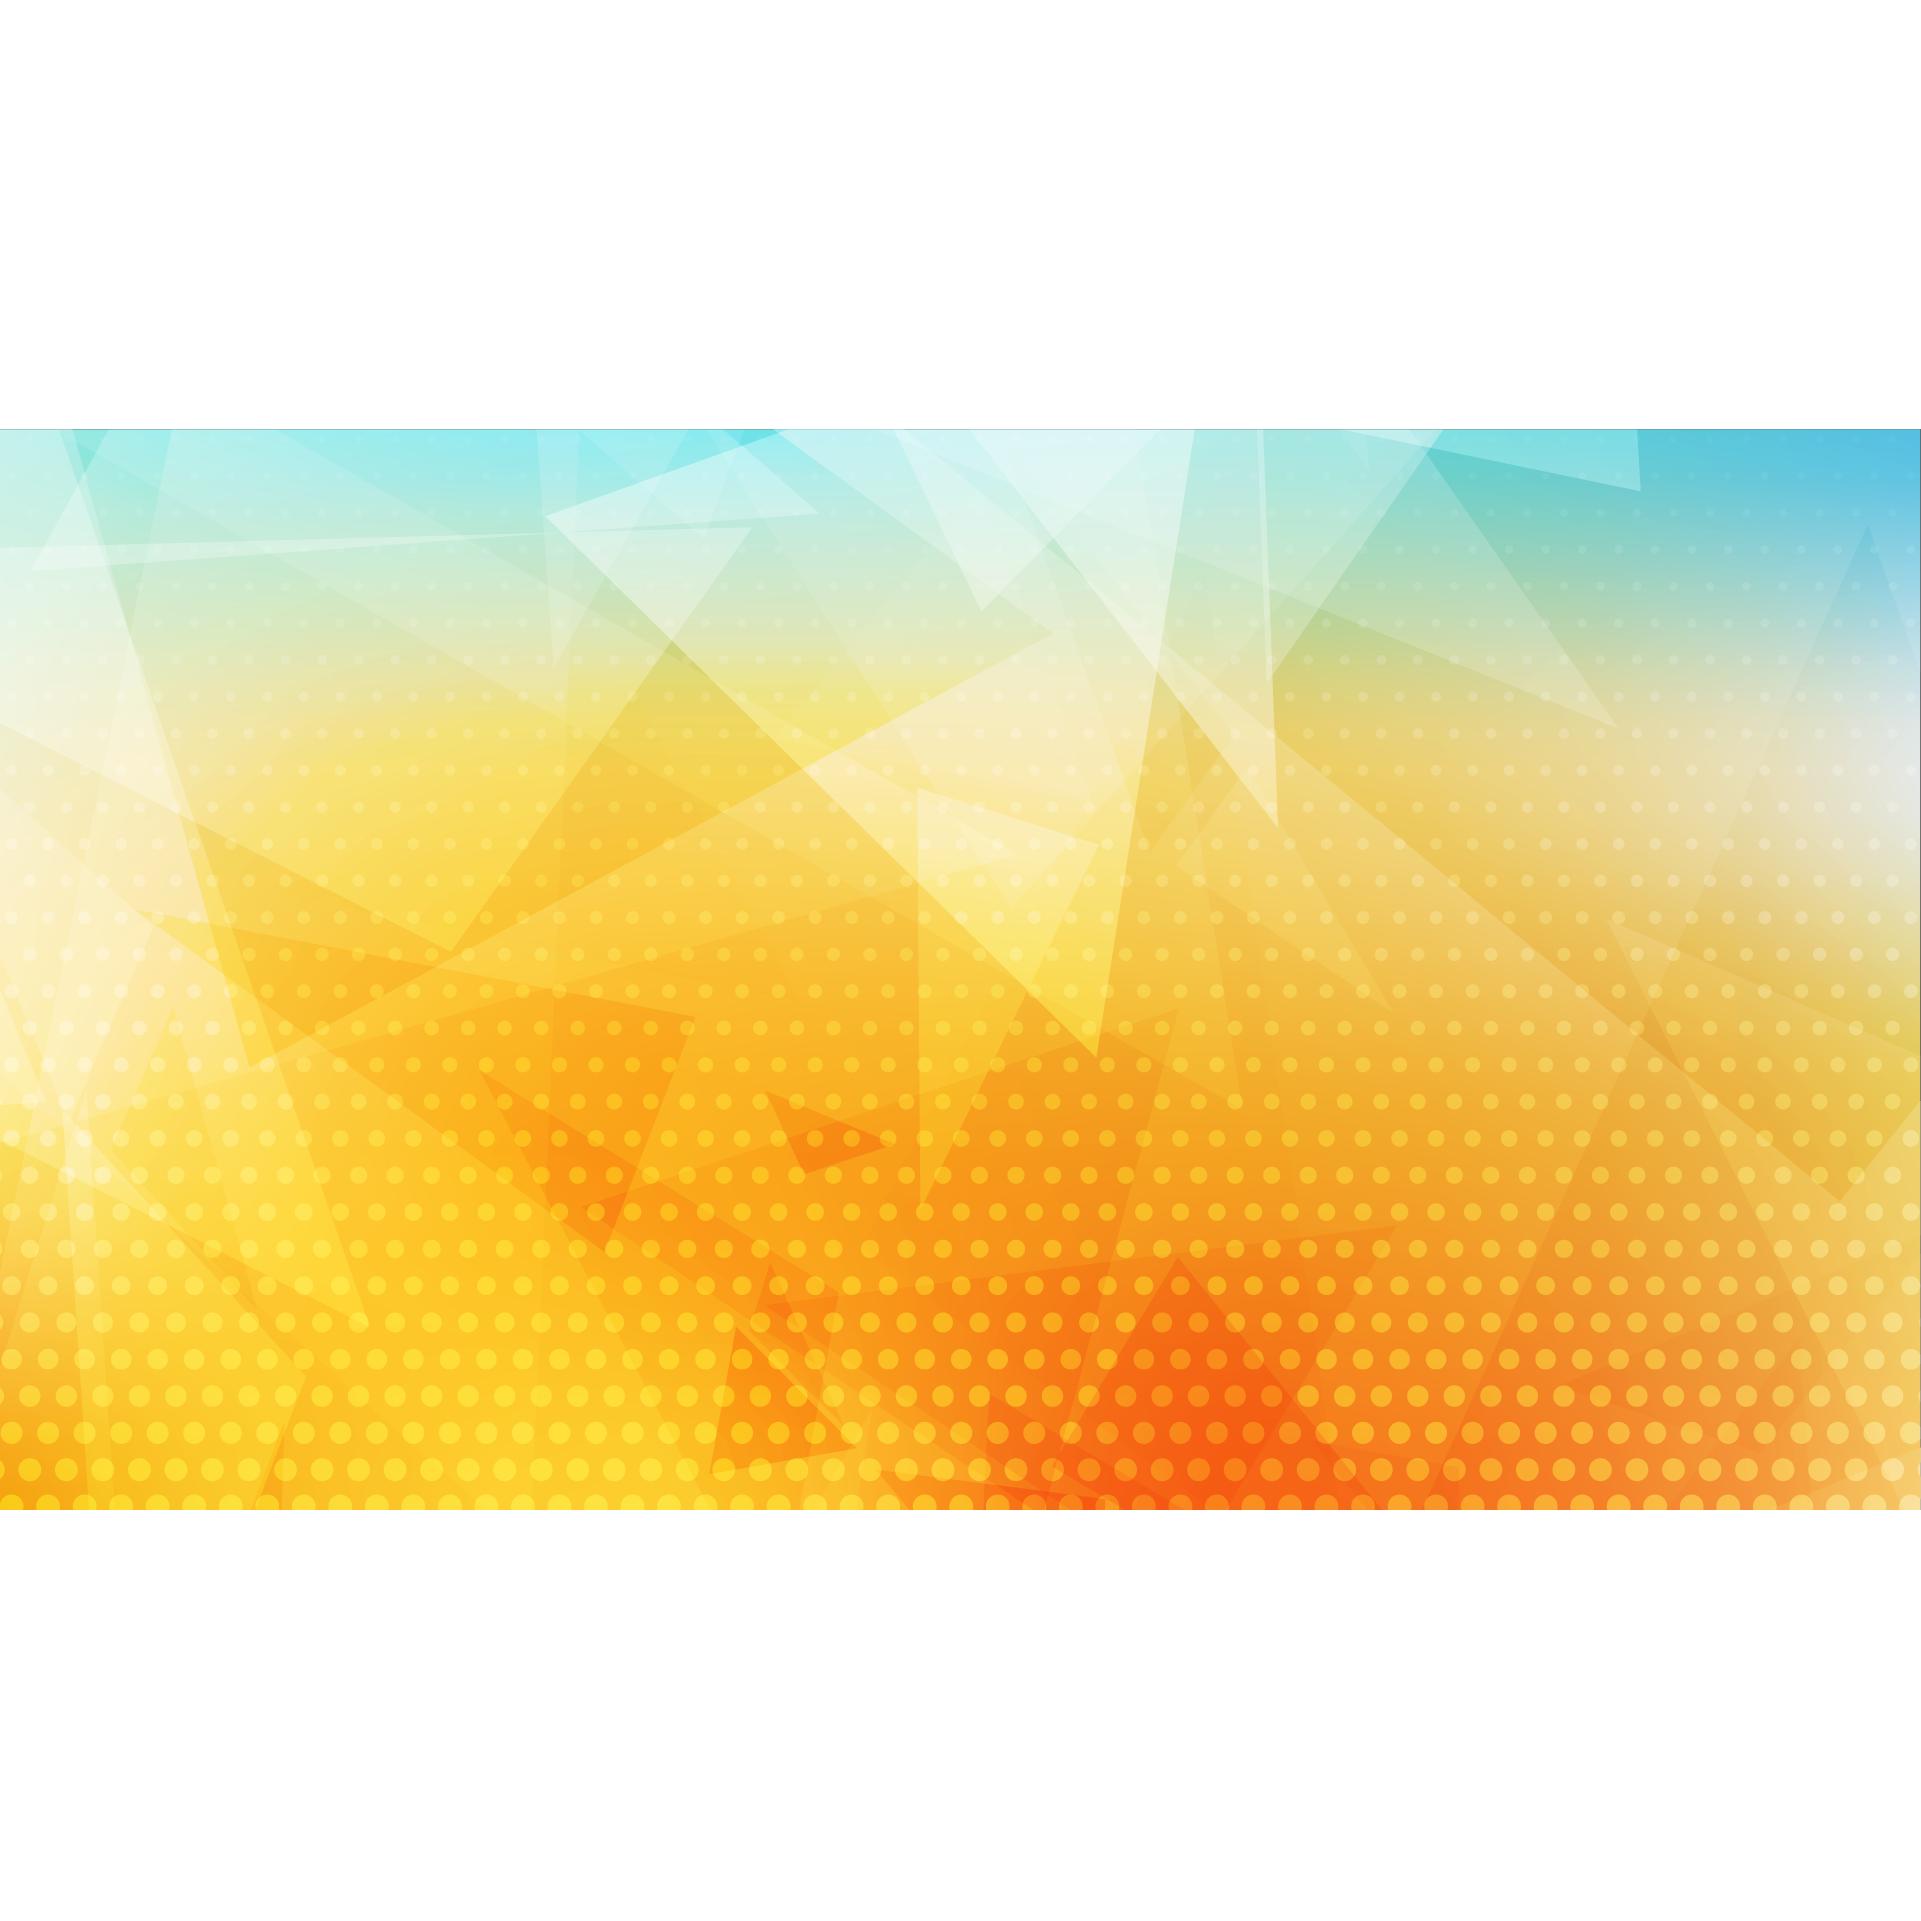 87226 orange wallpaper fortnite yellow desktop hq image free png